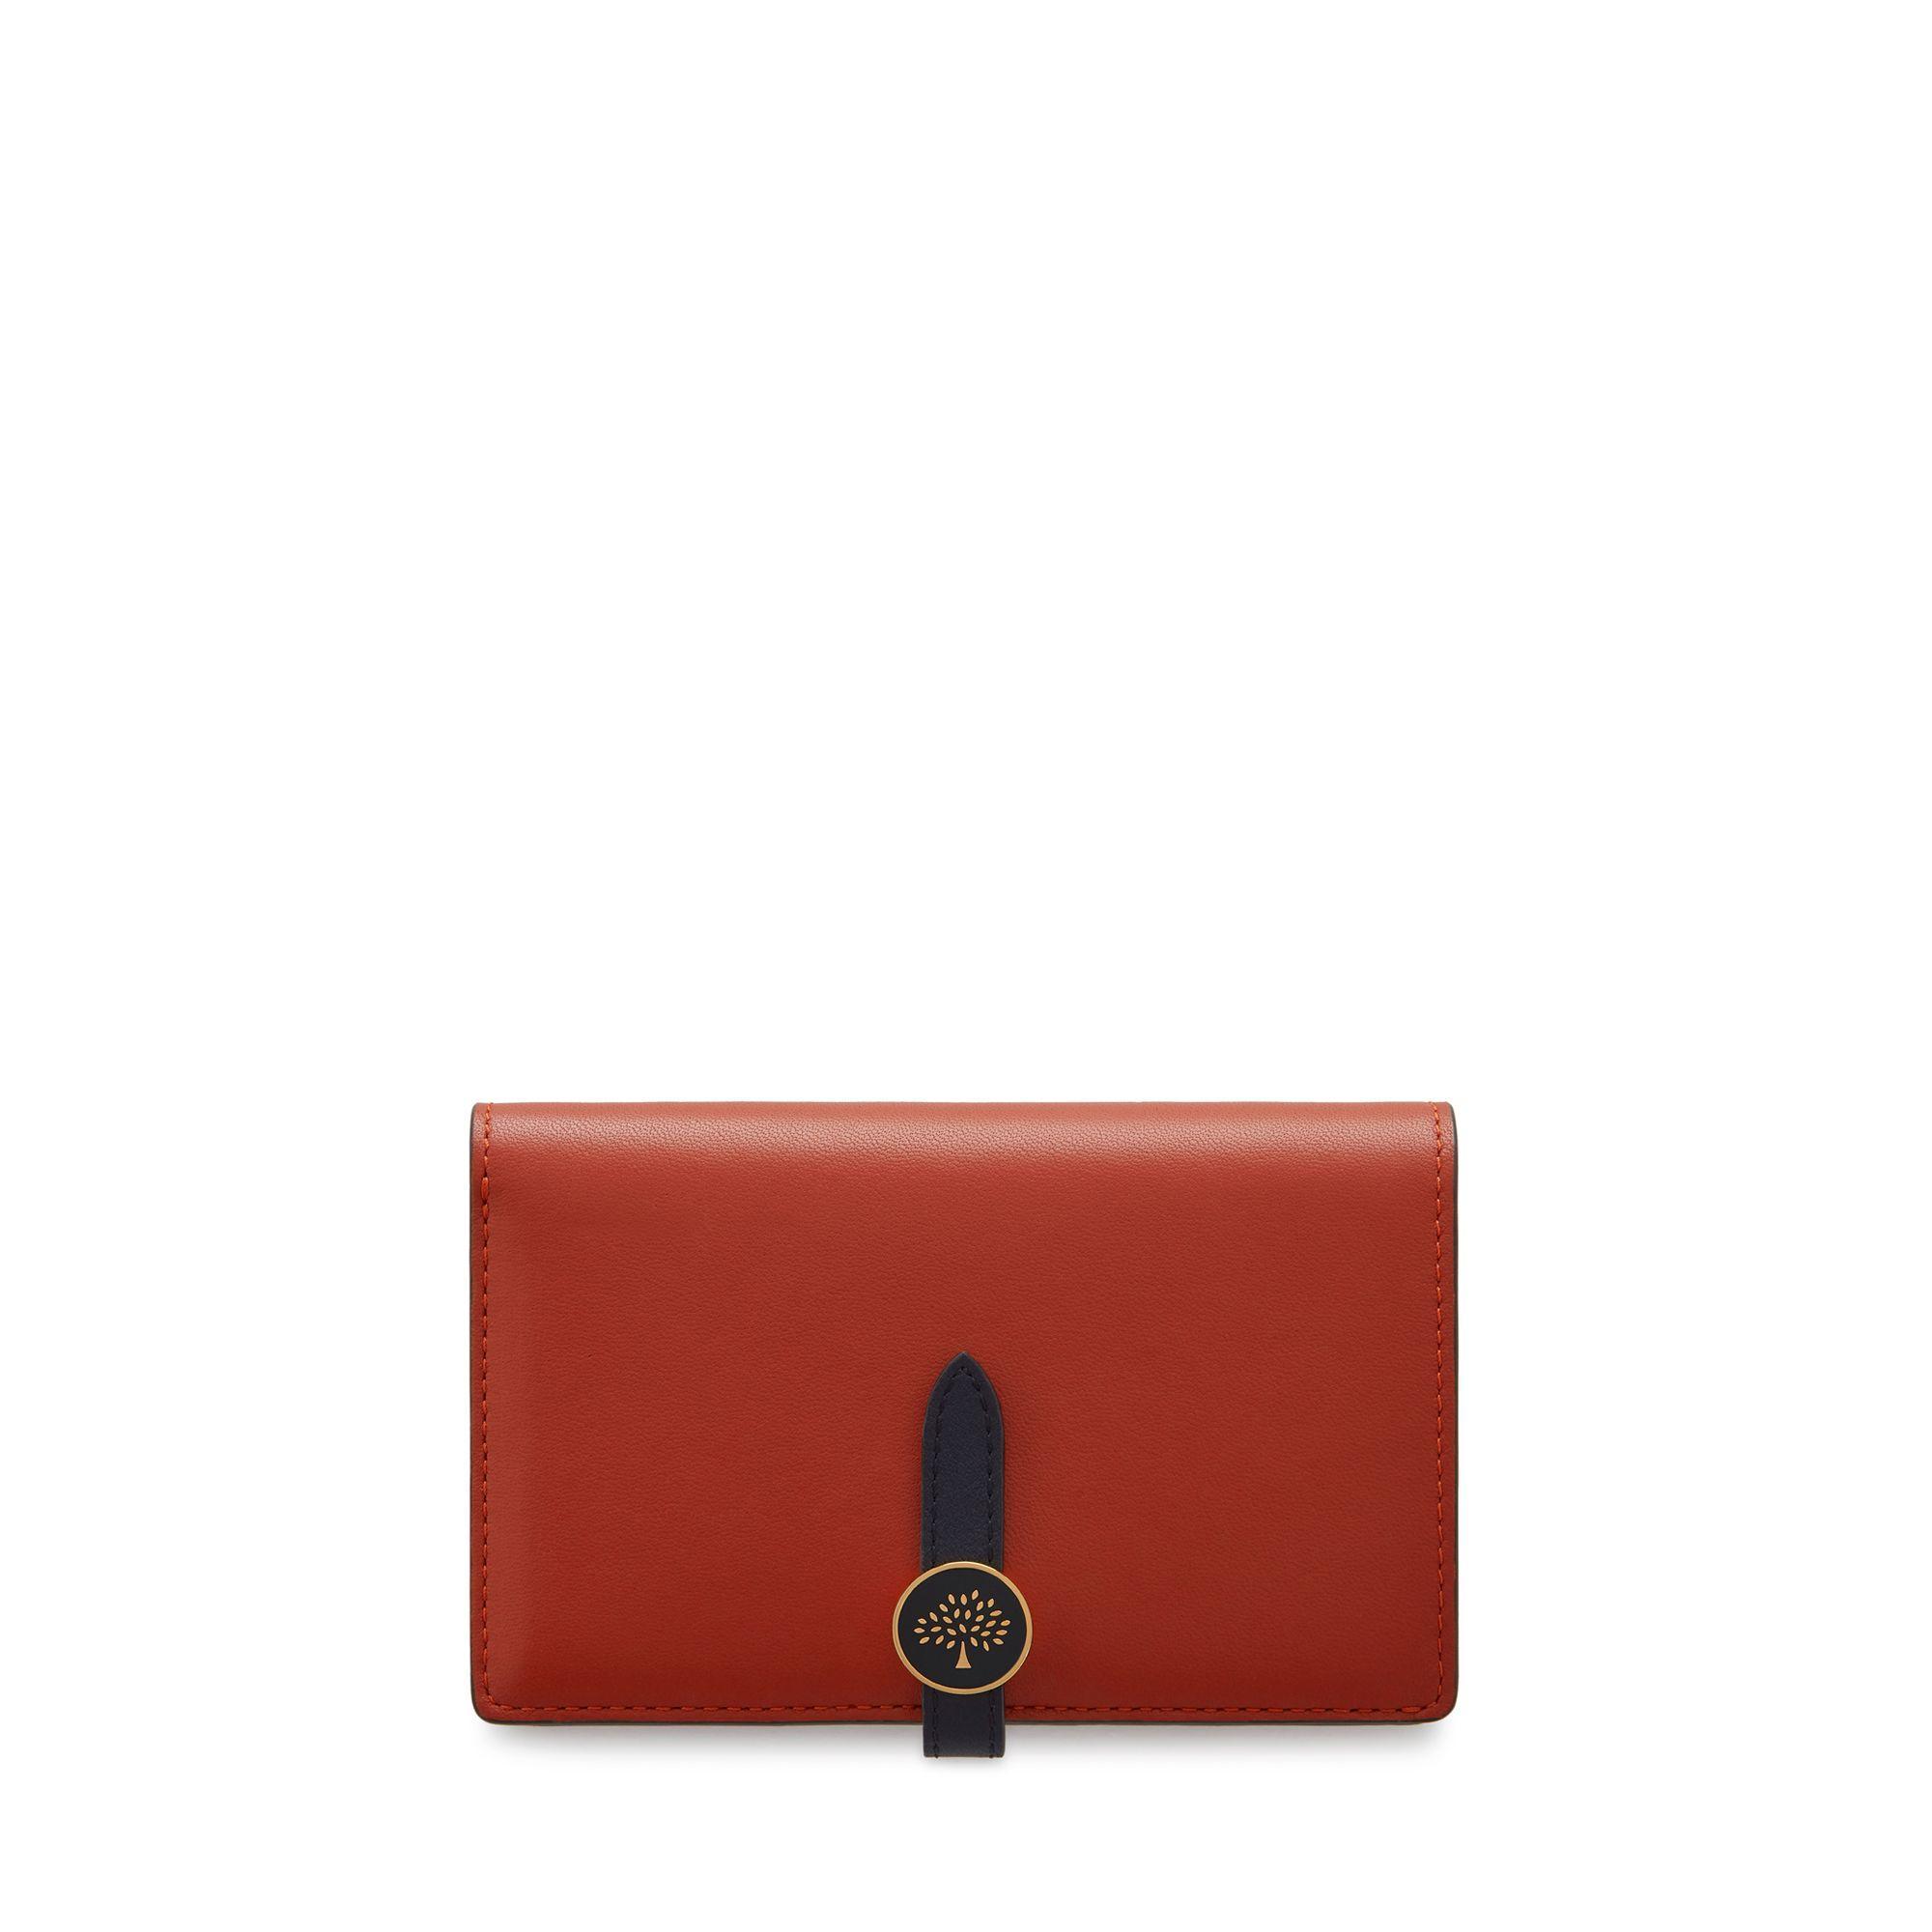 31668c293f9 Mulberry Tree Medium Wallet In Red Ochre Silky Calf in Red - Lyst